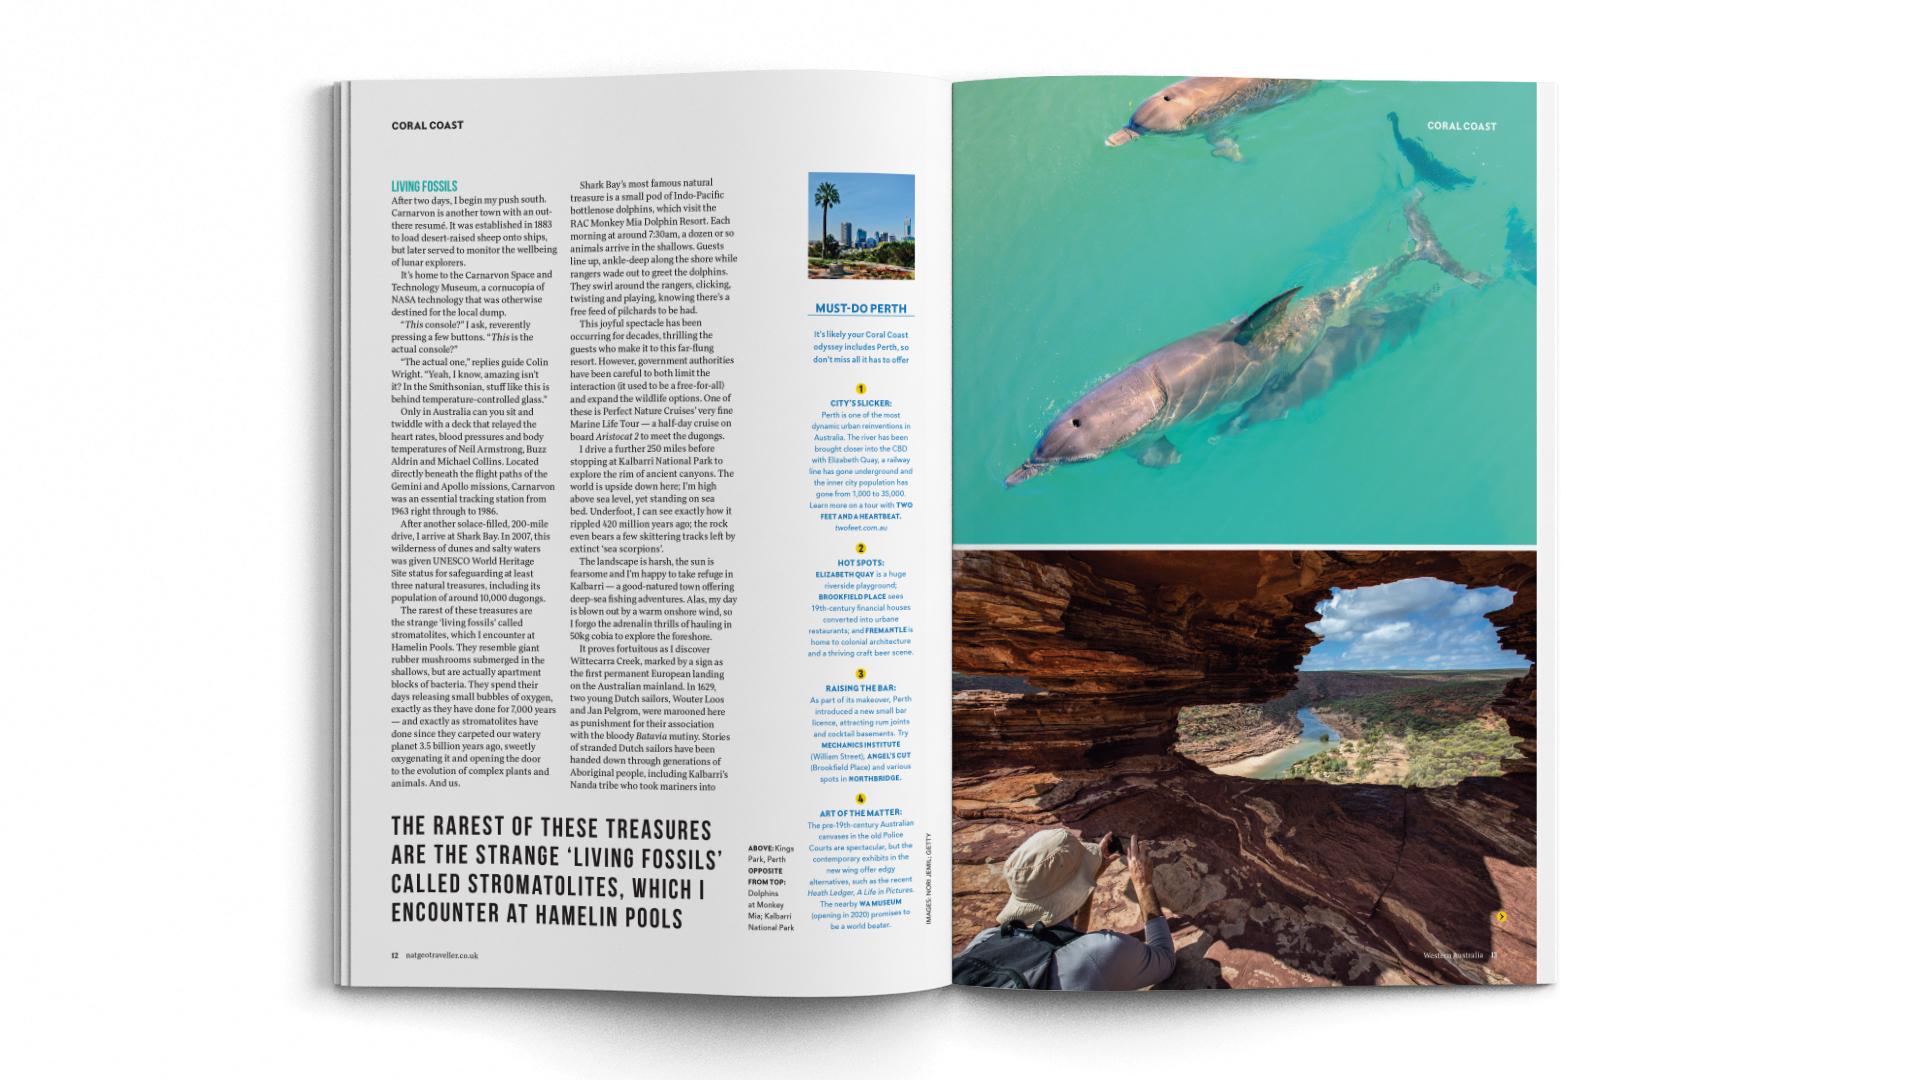 A4-Magazine-DPS-NGT-WA-Coral-Coast-3